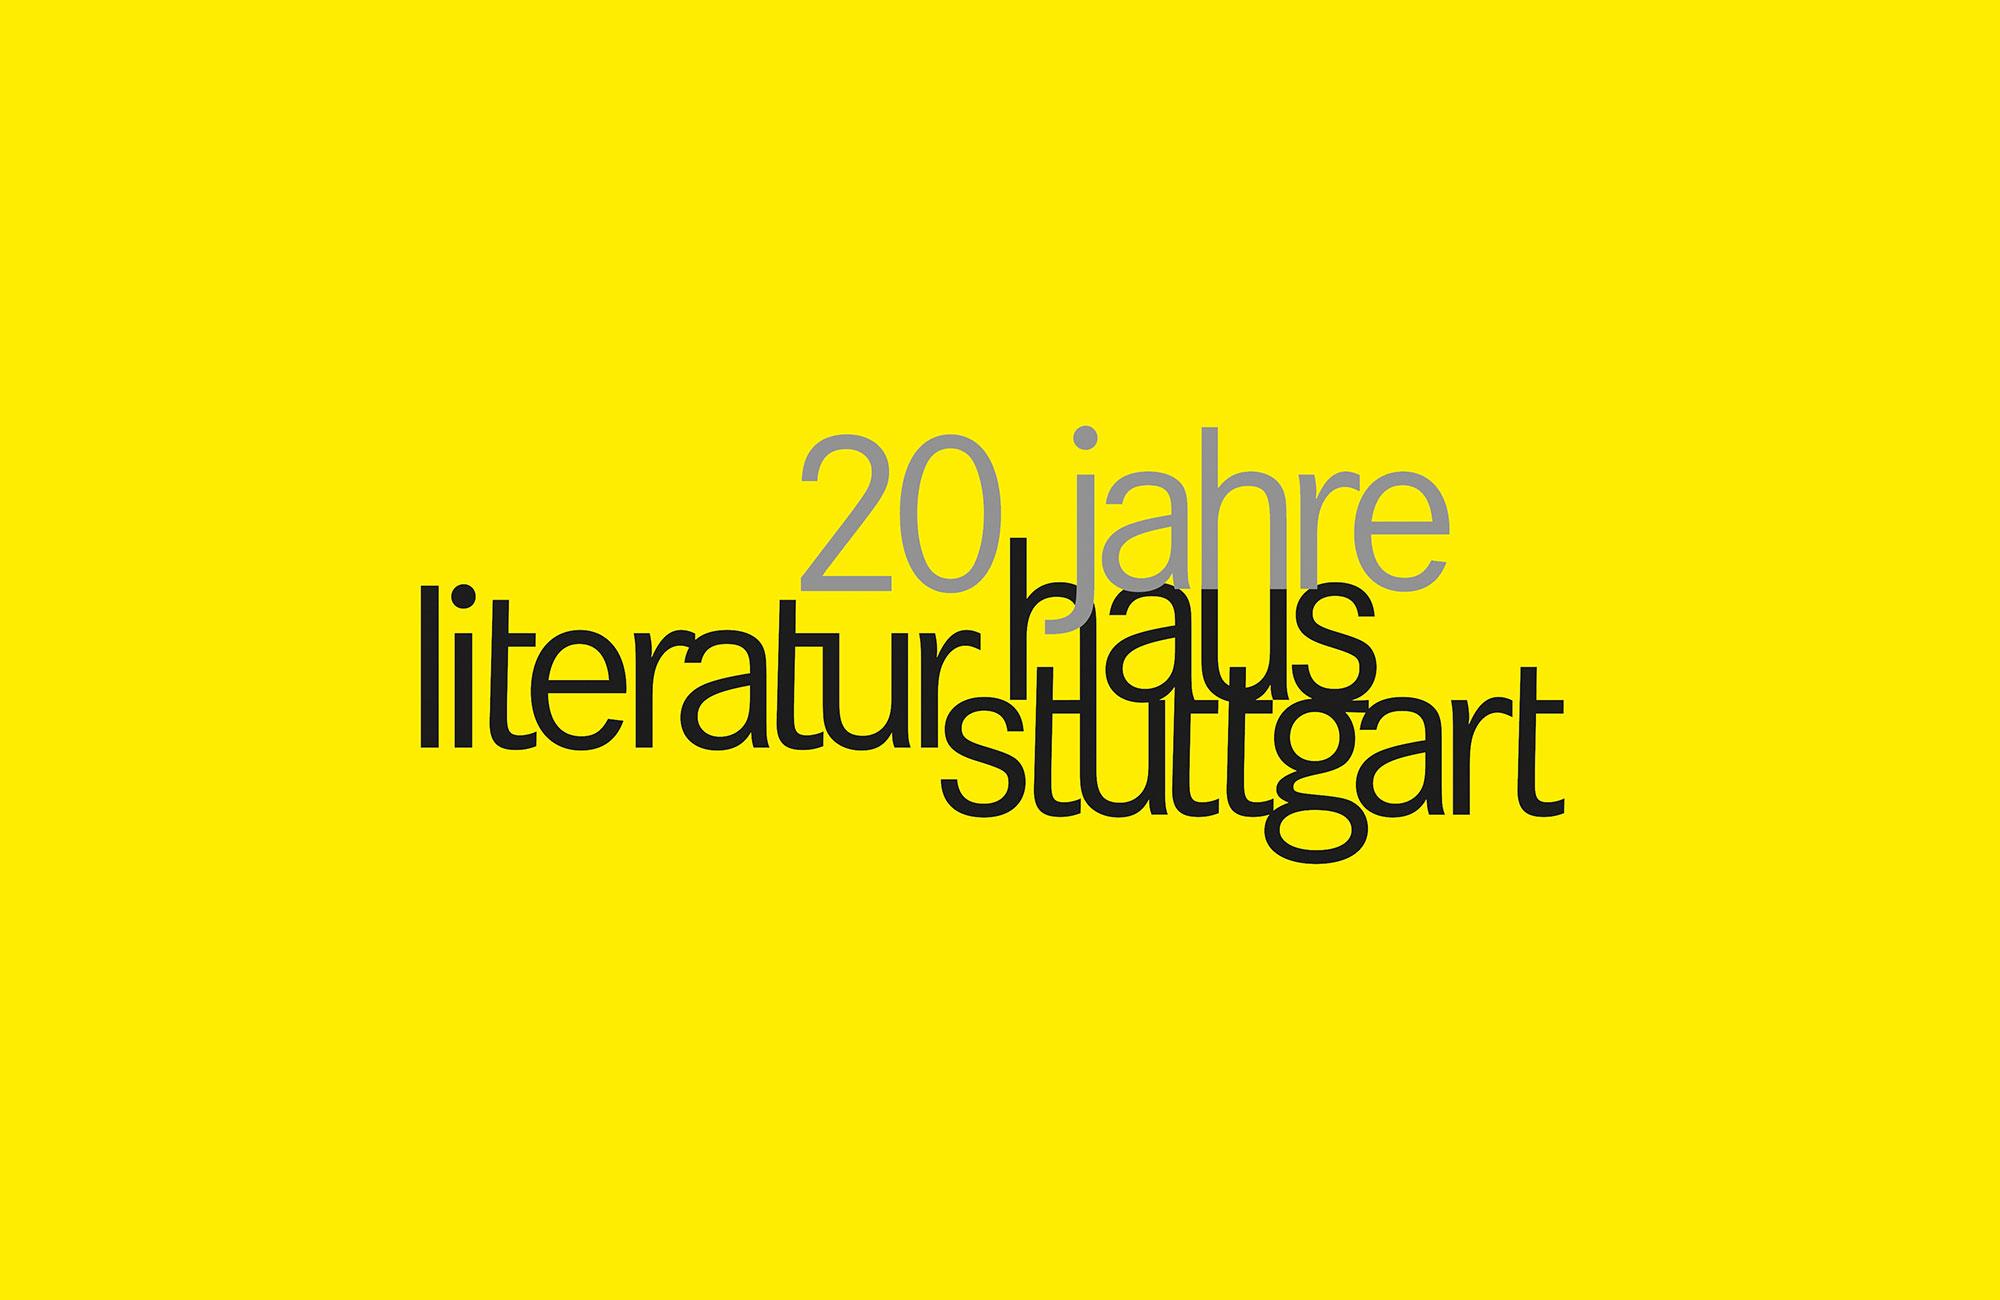 20 Jahre - Das Literaturhaus Stuttgart feiert